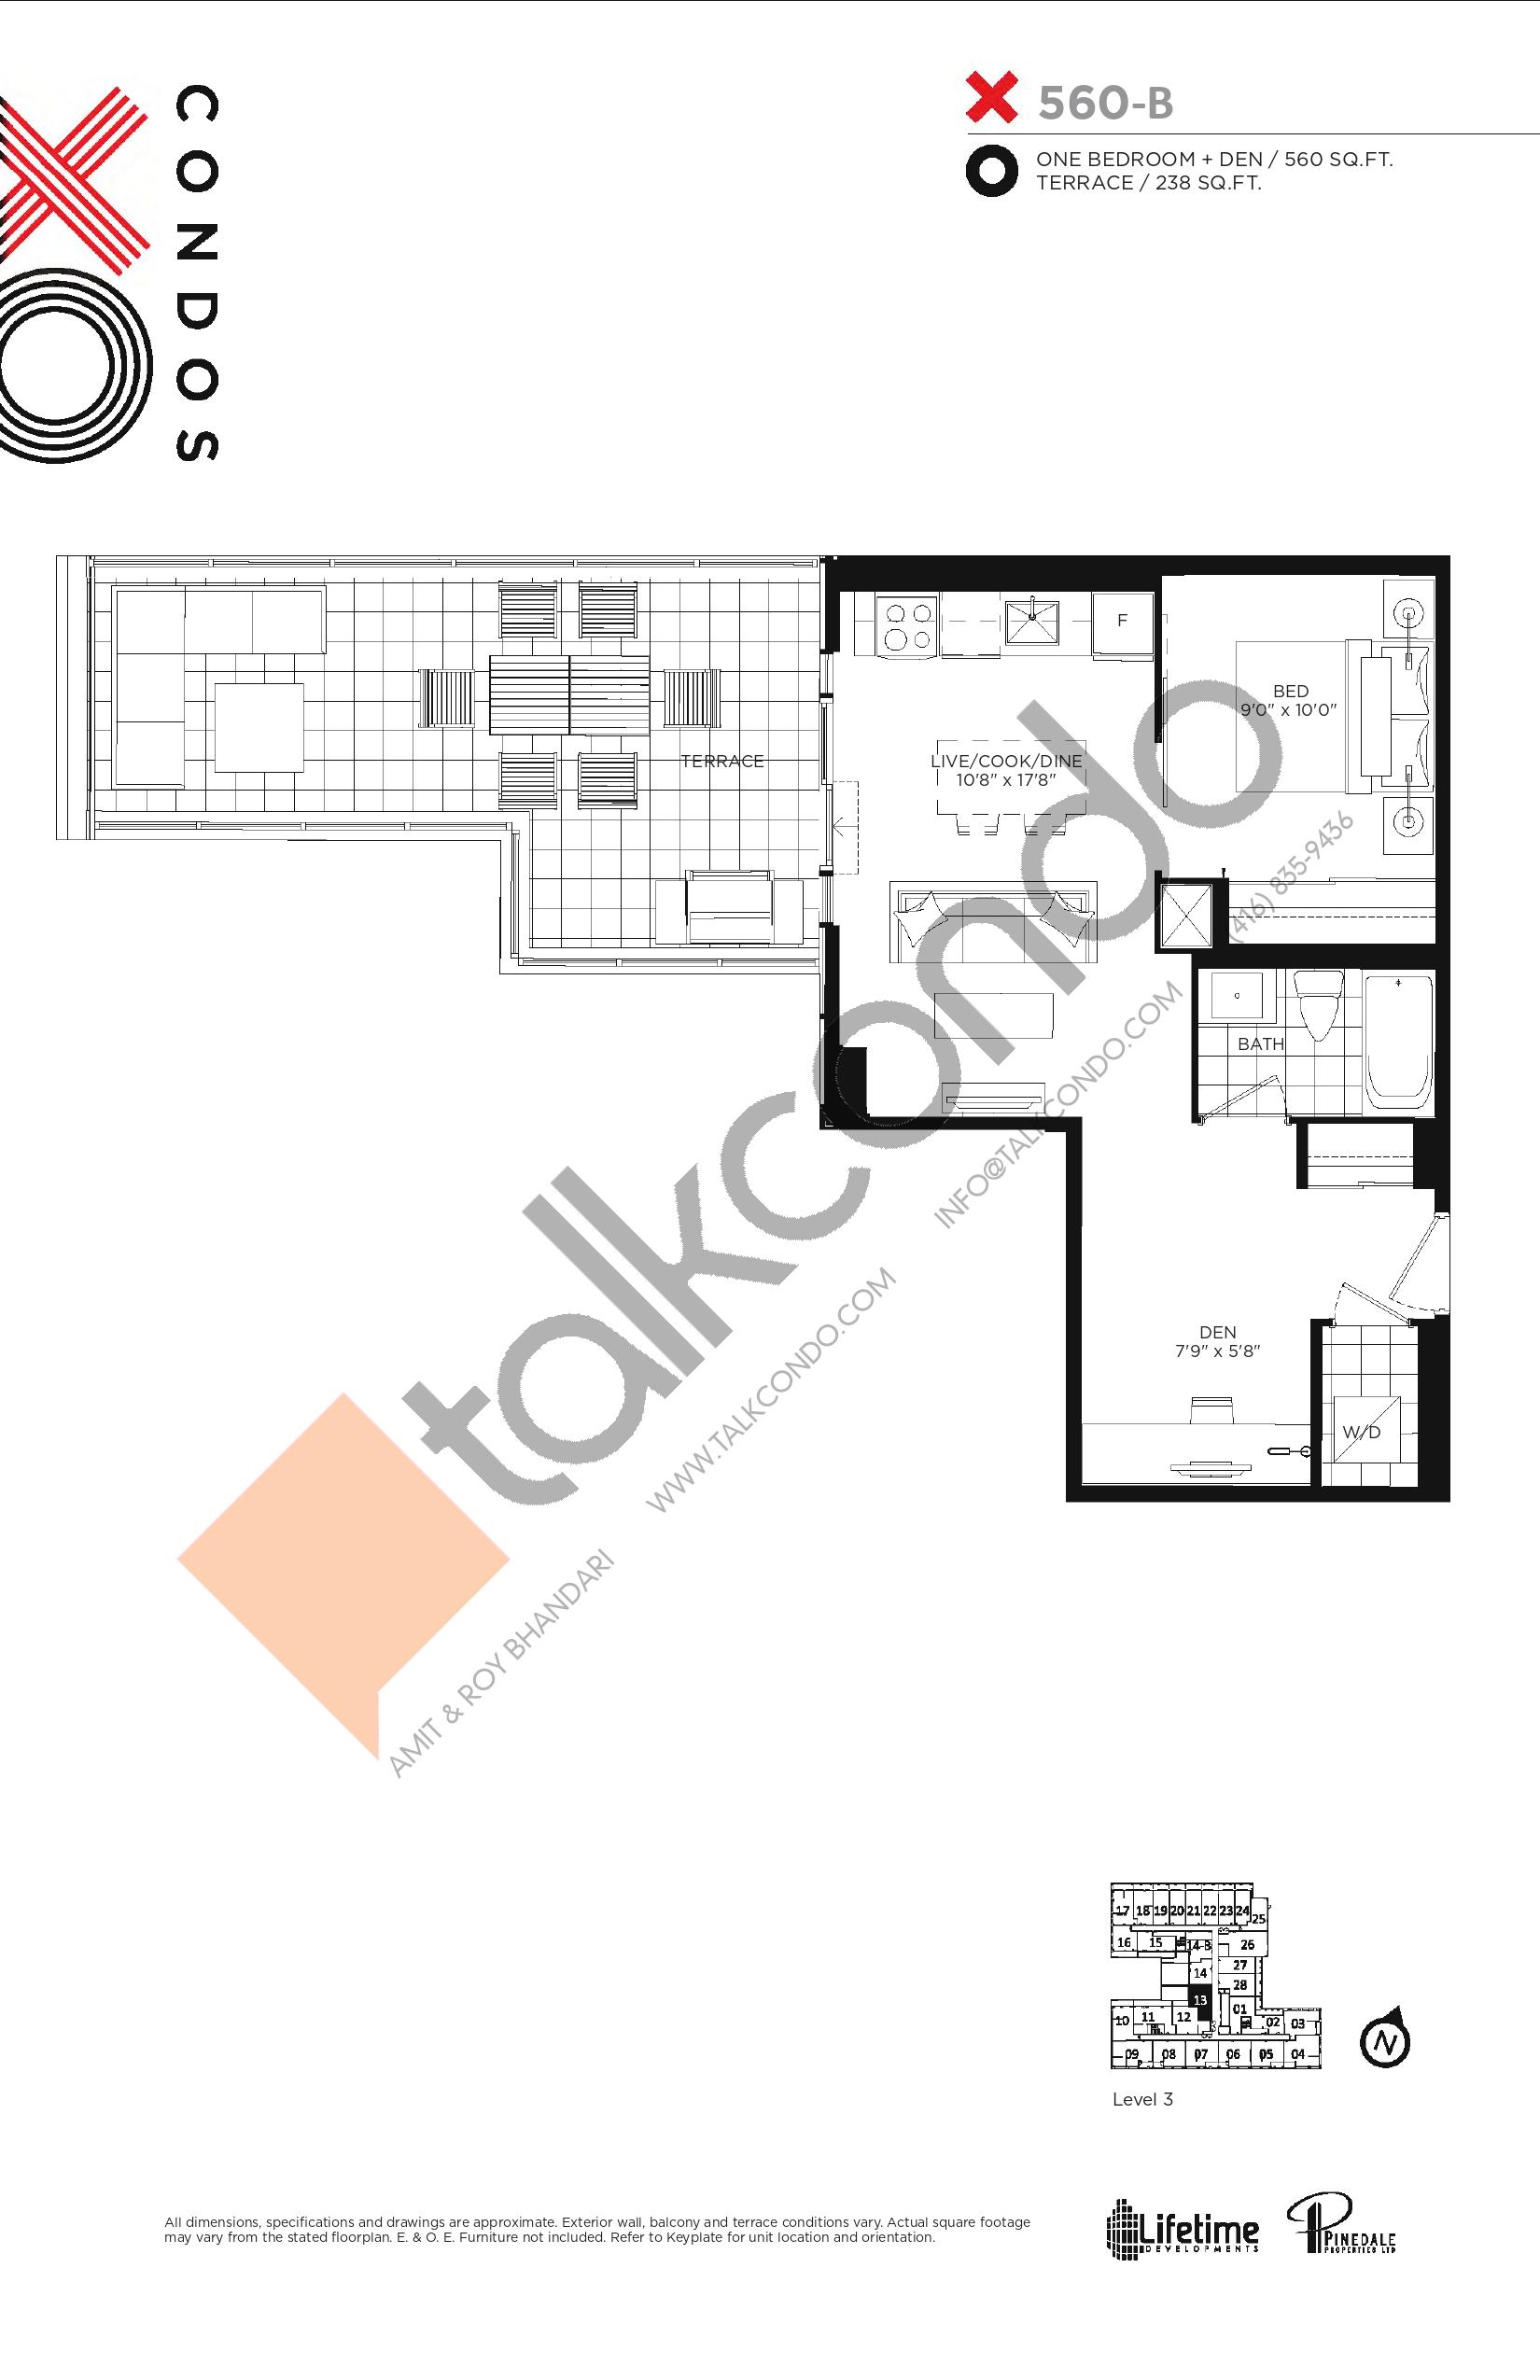 X560-B Floor Plan at XO Condos - 560 sq.ft